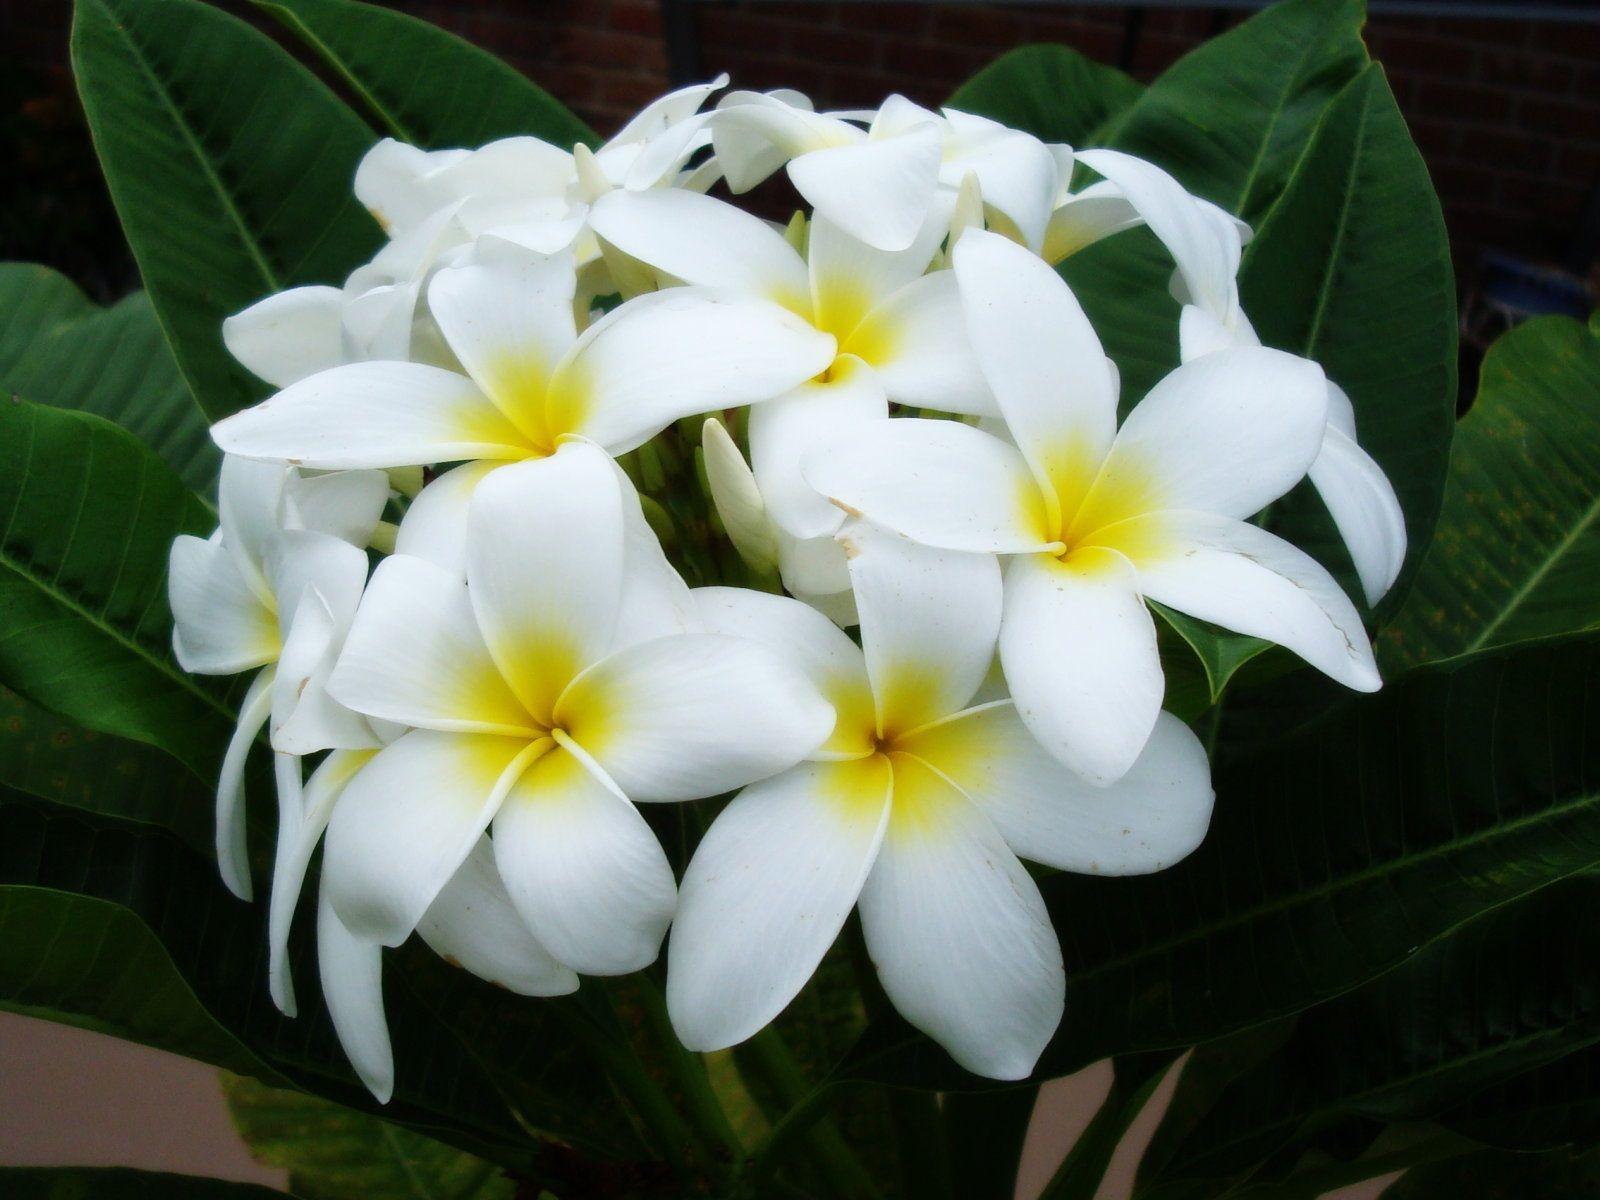 La Flor Nacional Sacuanjoche Flora Flowers Frangipani Plumeria